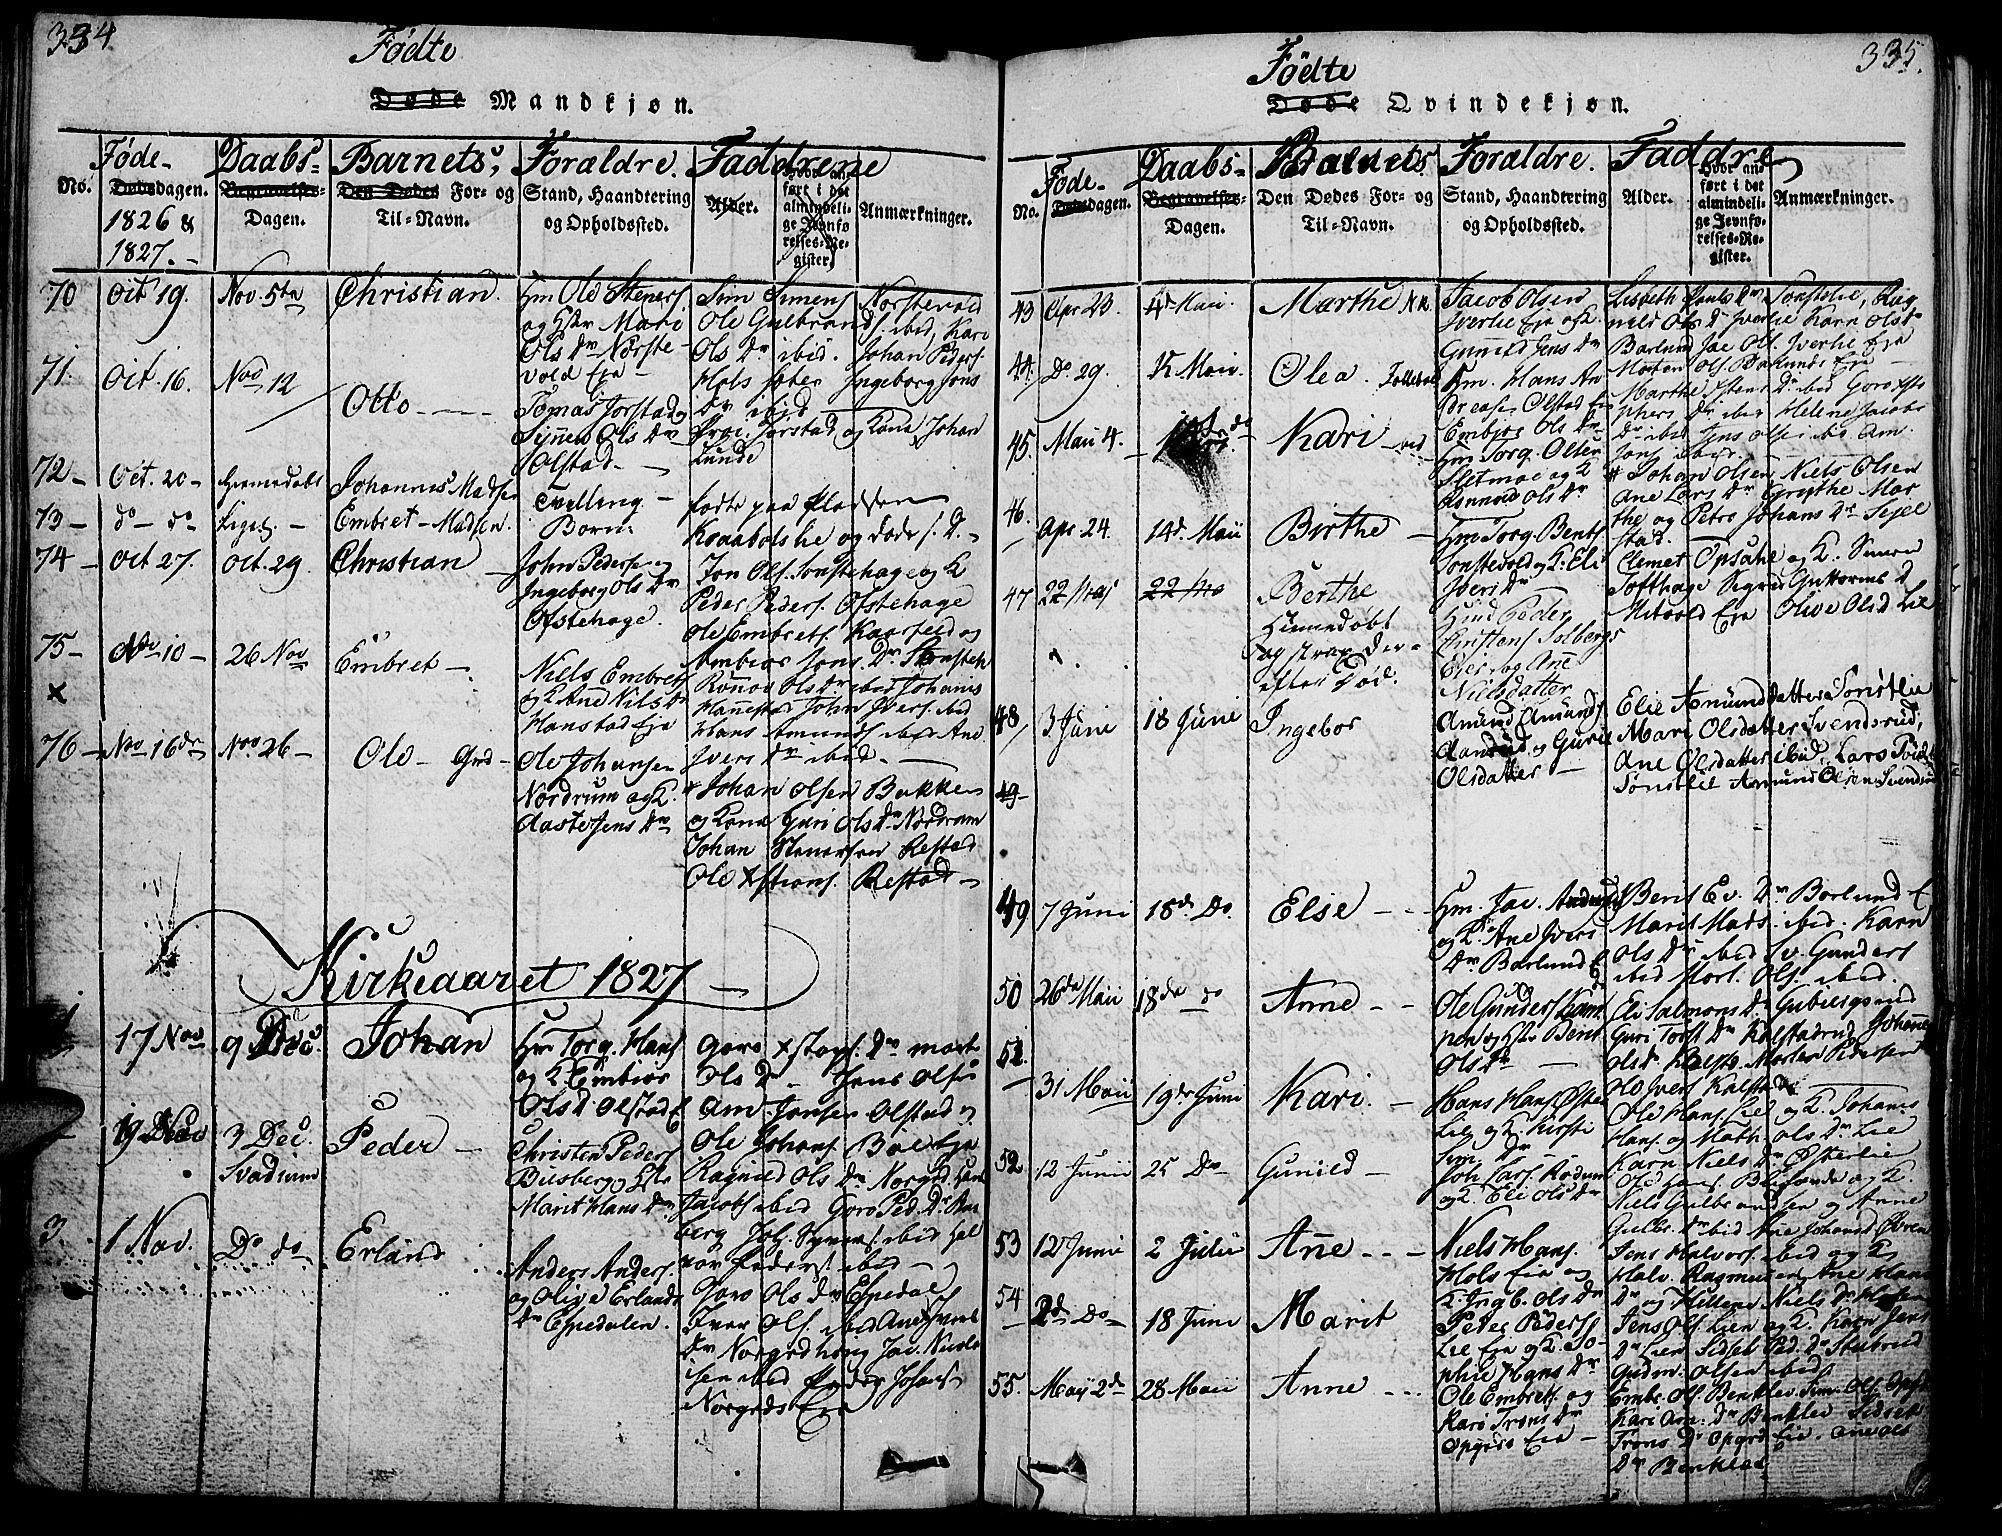 SAH, Gausdal prestekontor, Ministerialbok nr. 5, 1817-1829, s. 334-335